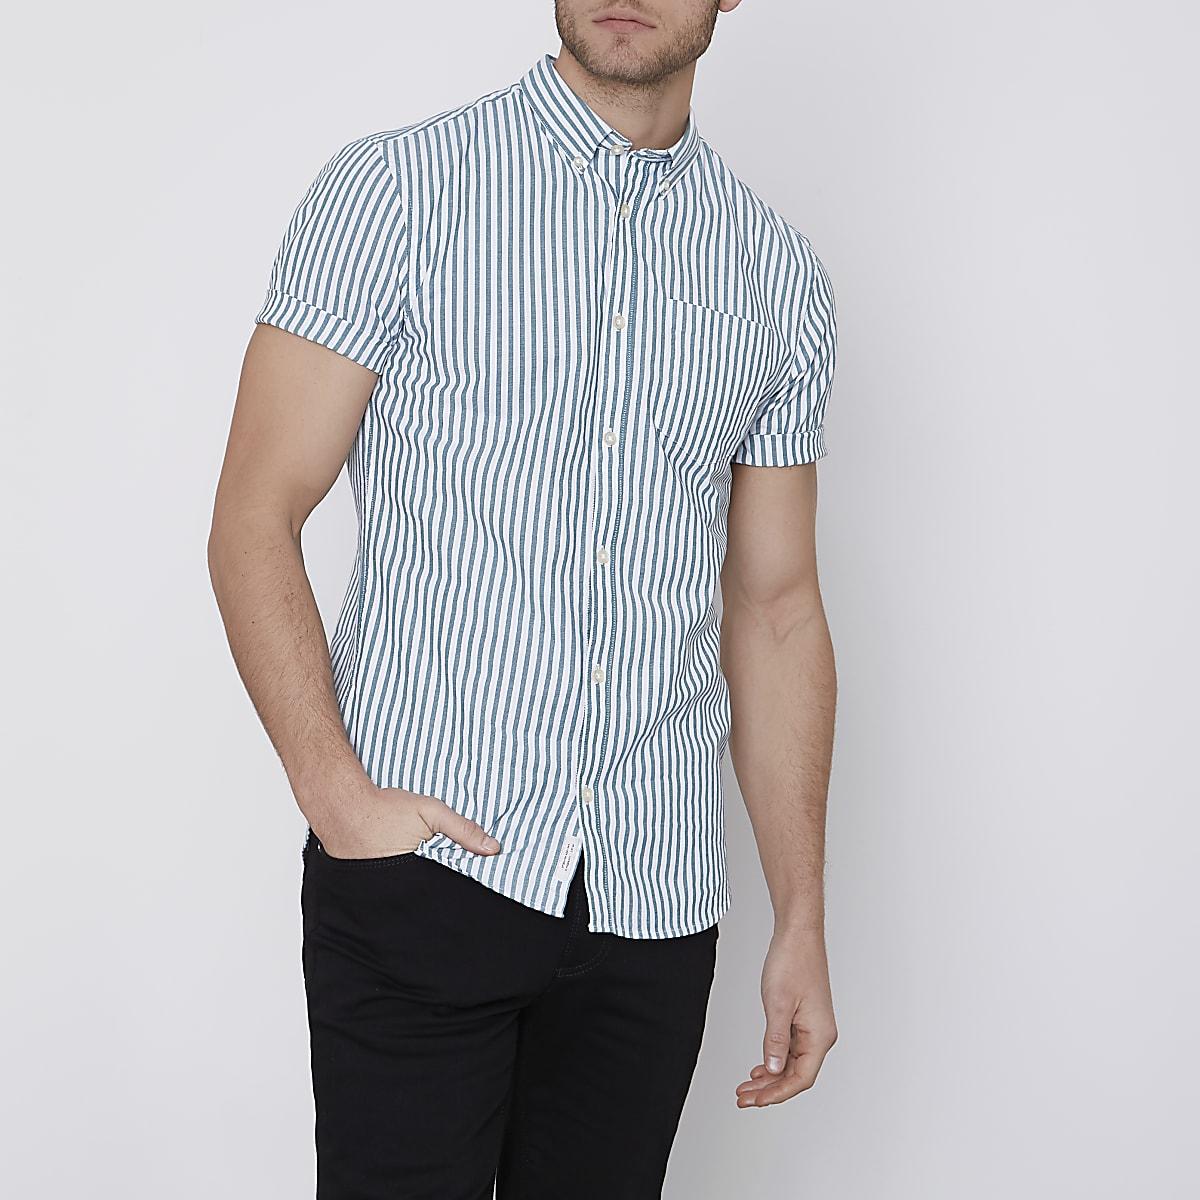 Green stripe muscle fit short sleeve shirt